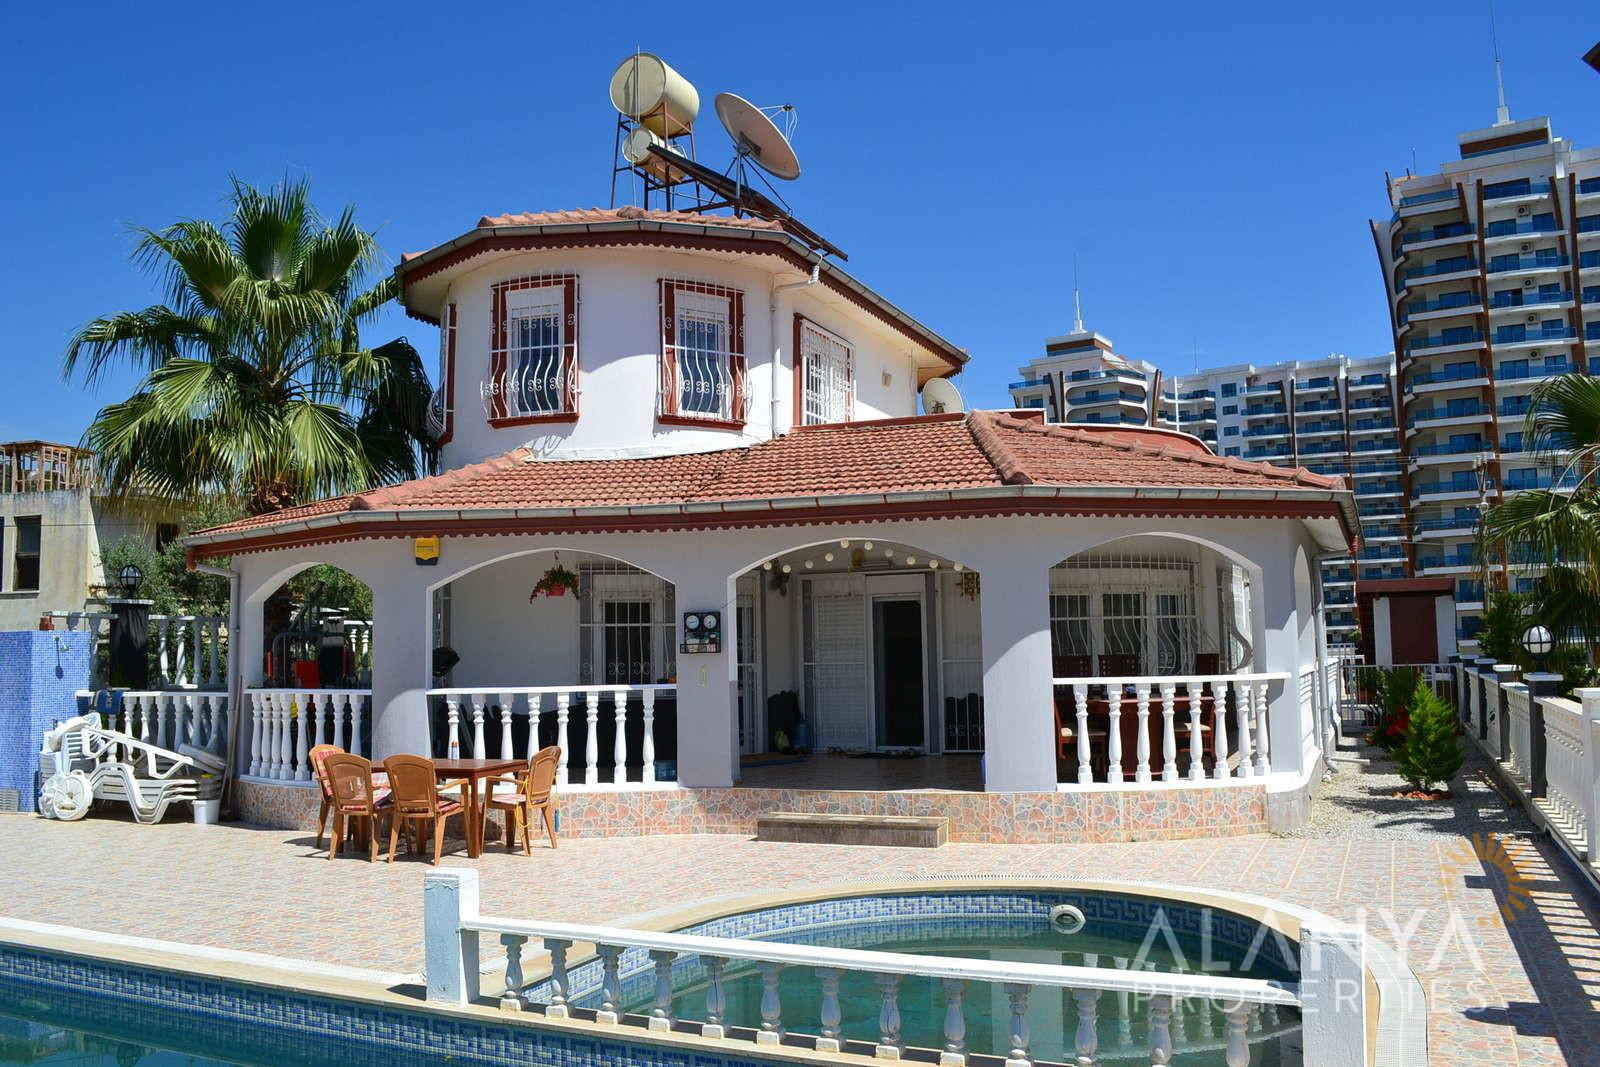 Villa te koop 3 slaapkamers, volledig gemeubileerd in Mahmutlar, Alanya